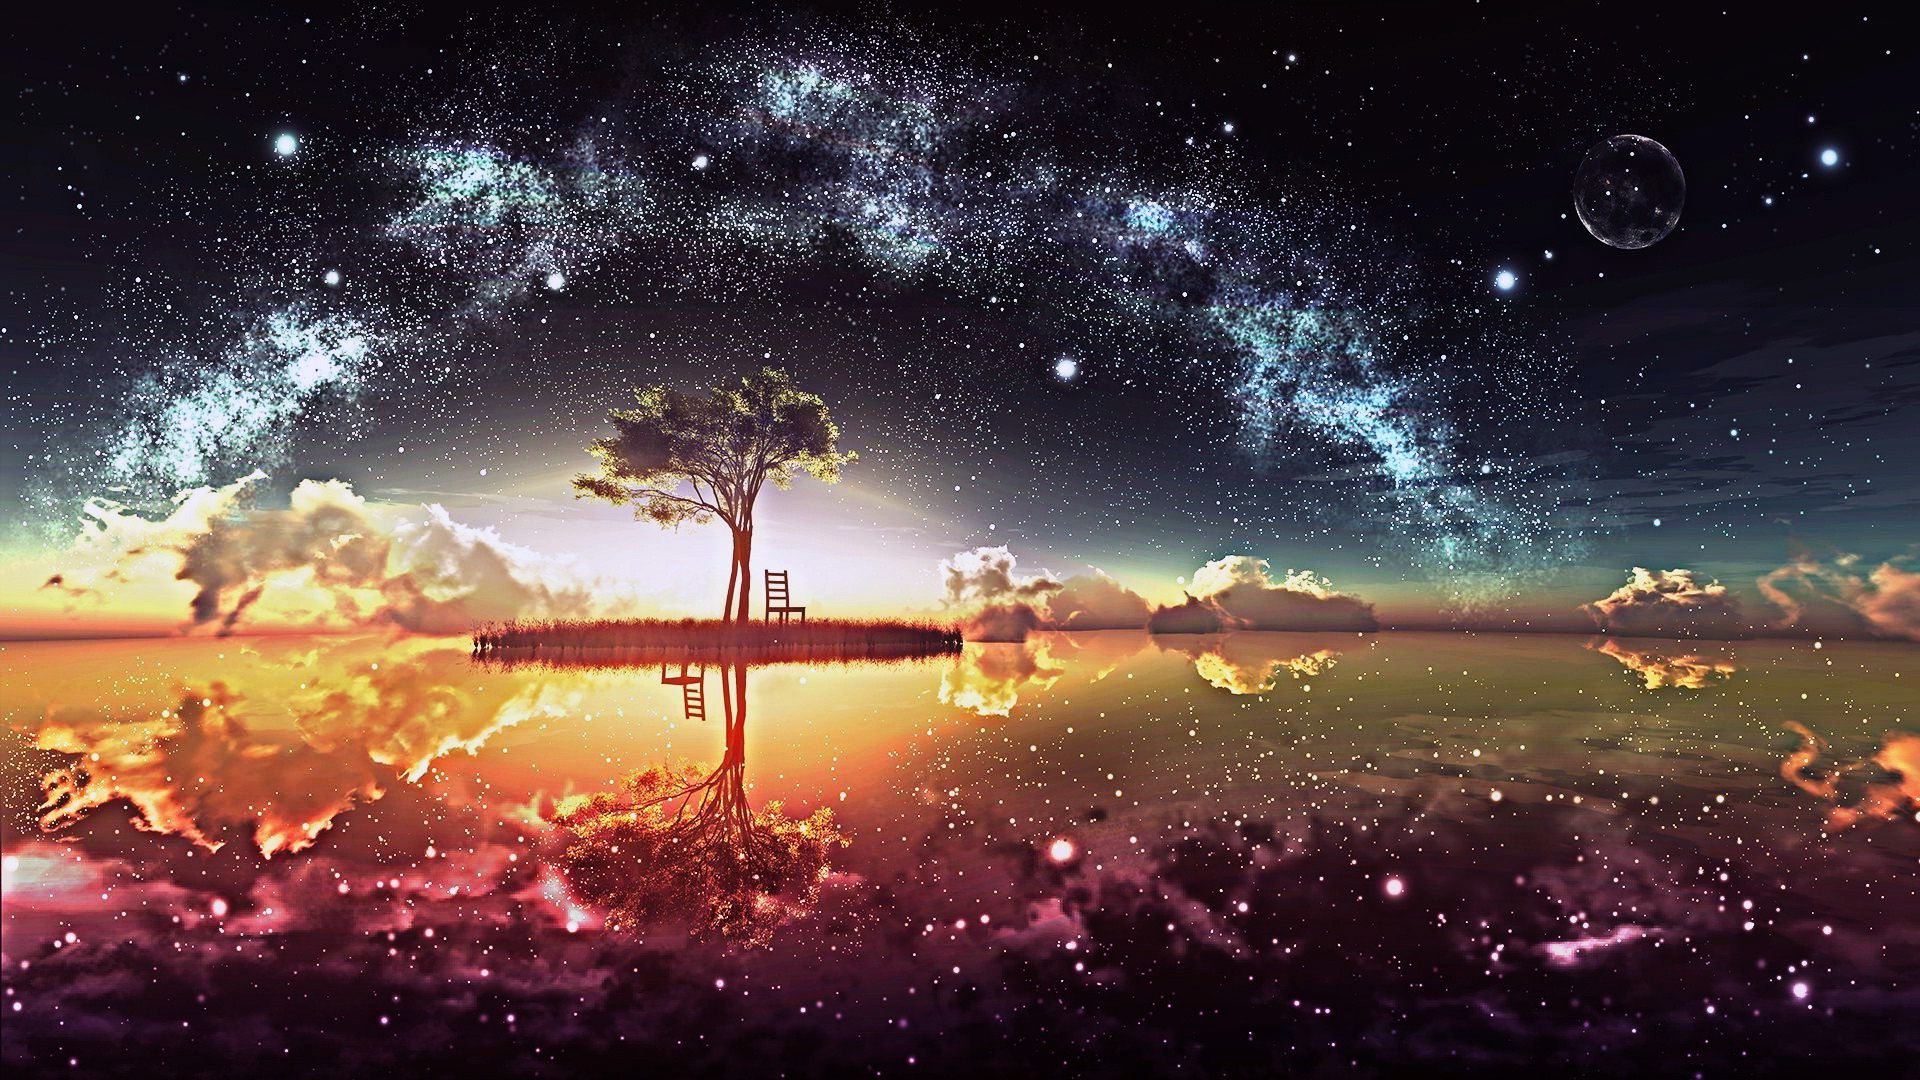 Amazing Paradise Beautiful Night Scenery Wallpaper Landscape Wallpaper Anime Scenery Wallpaper